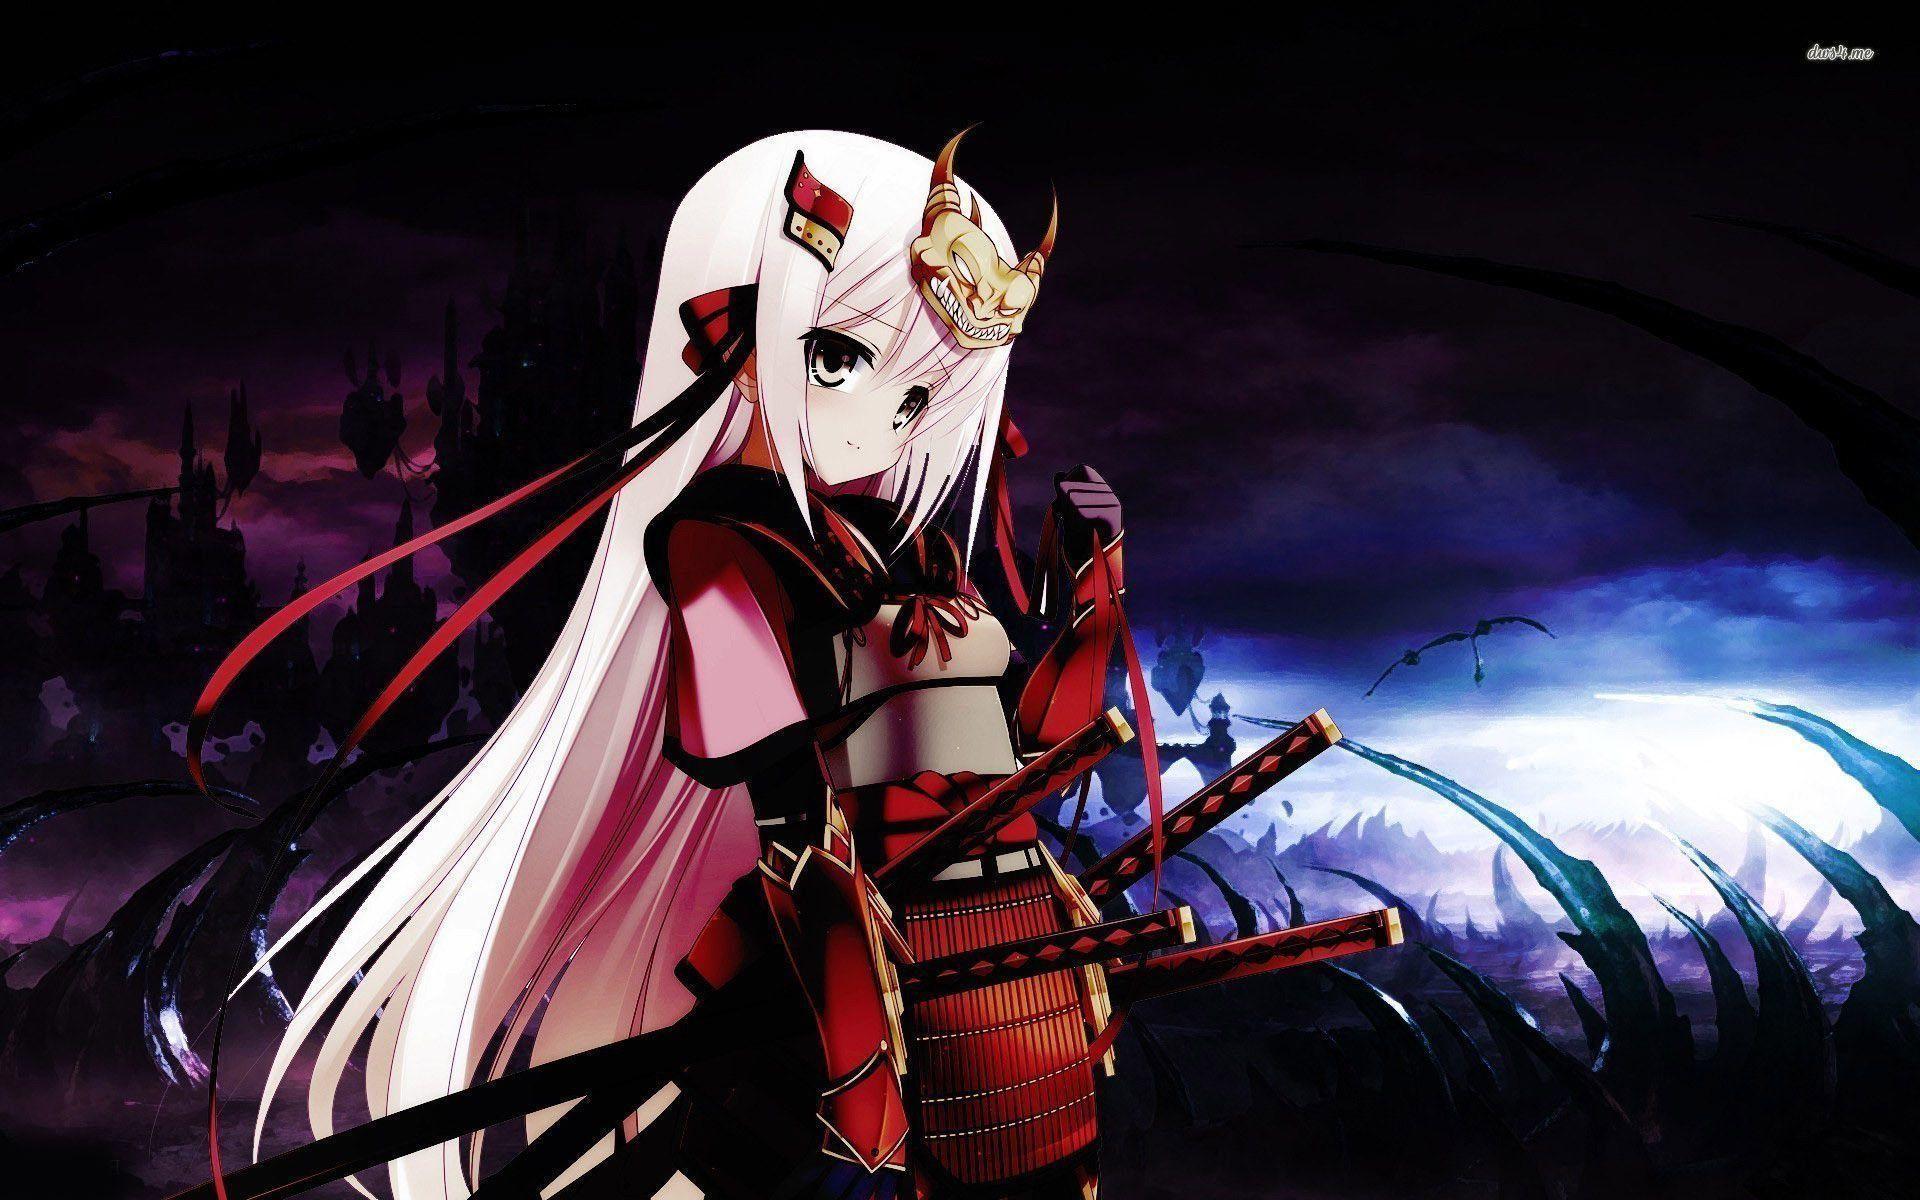 X Samurai Girl Wallpaper Anime Wallpapers